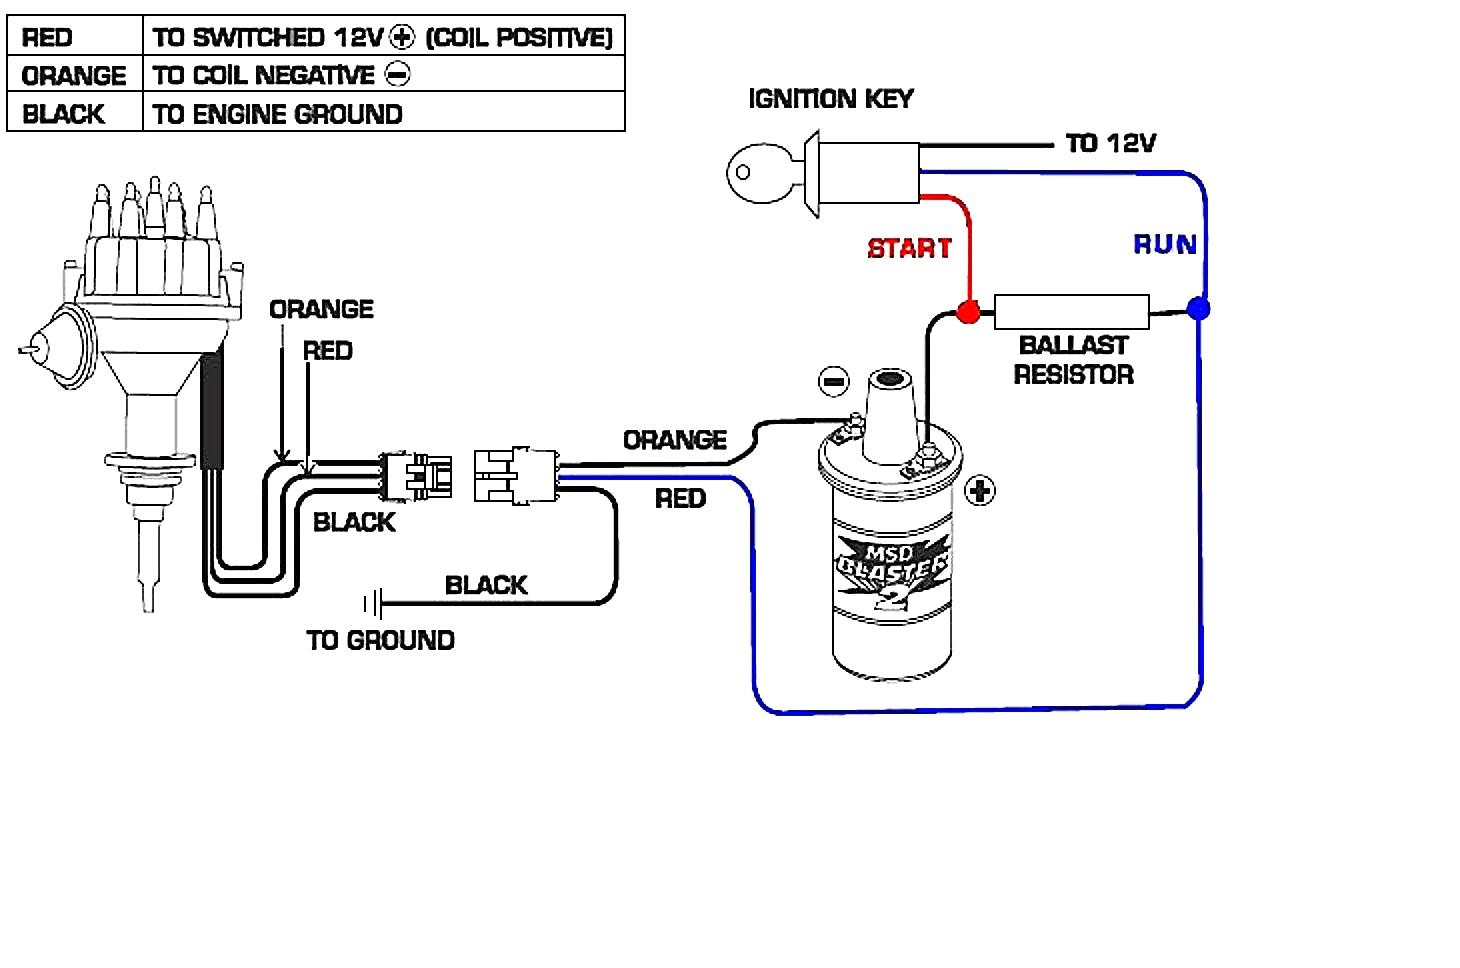 Ford 302 Ignition Coil Wiring - Wiring Diagram Detailed - Duraspark 2 Wiring Diagram